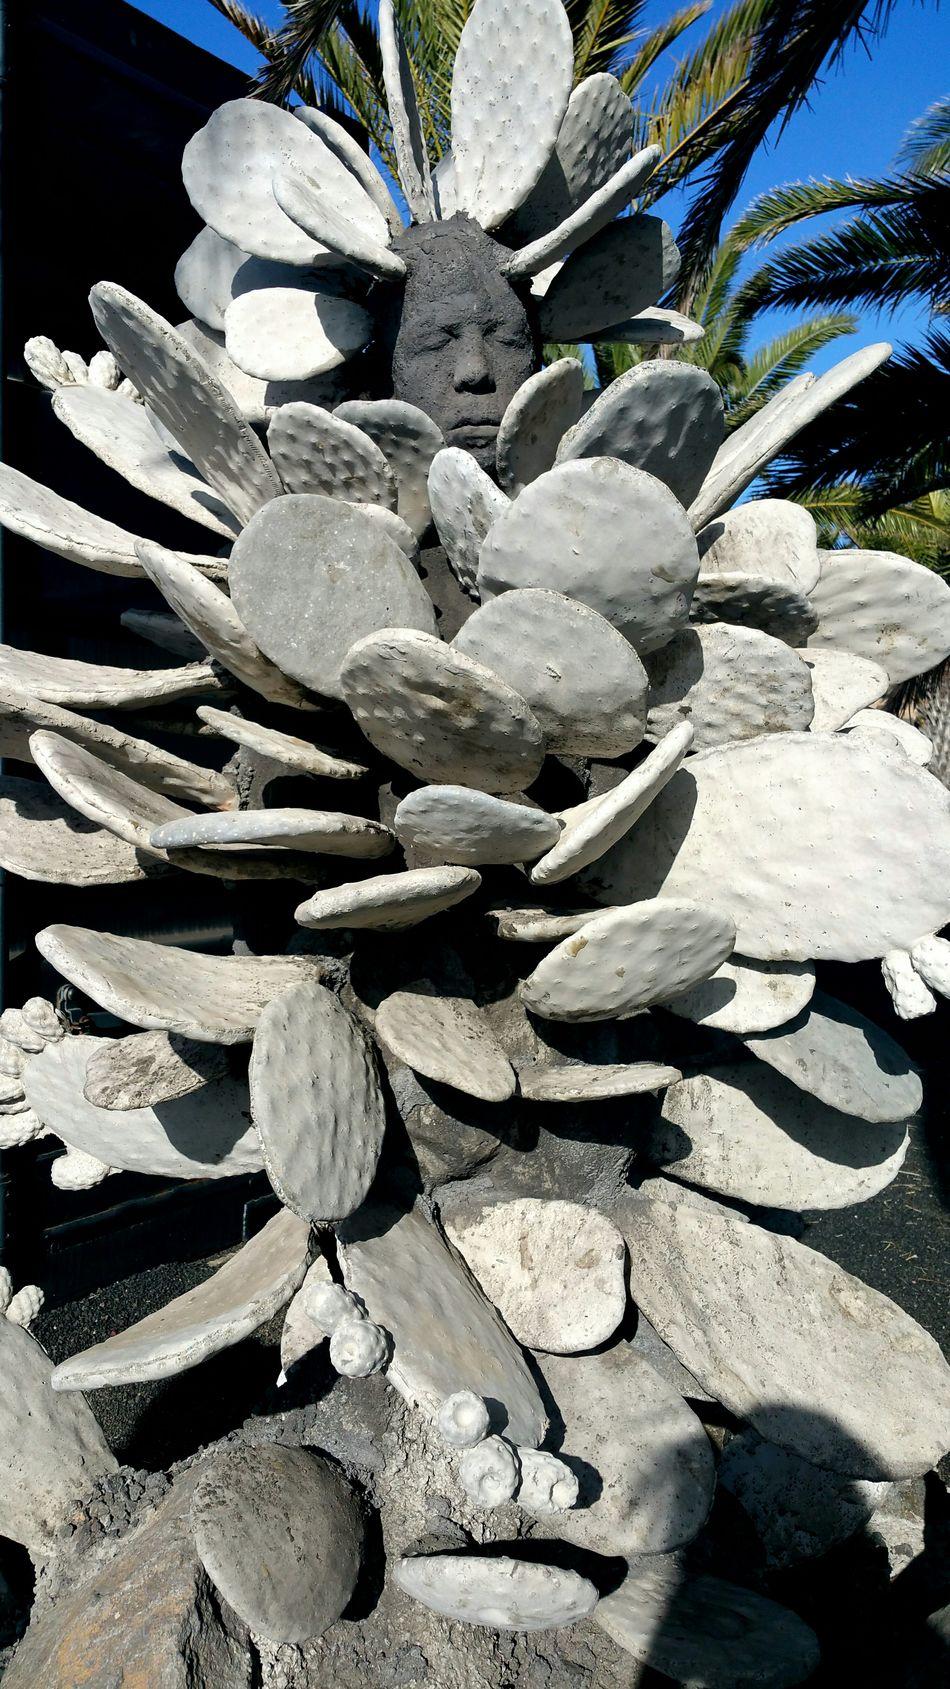 Expressive Sculpture Sculpture Garden Sculpture  Lanzarote Canary Islands Arrecife